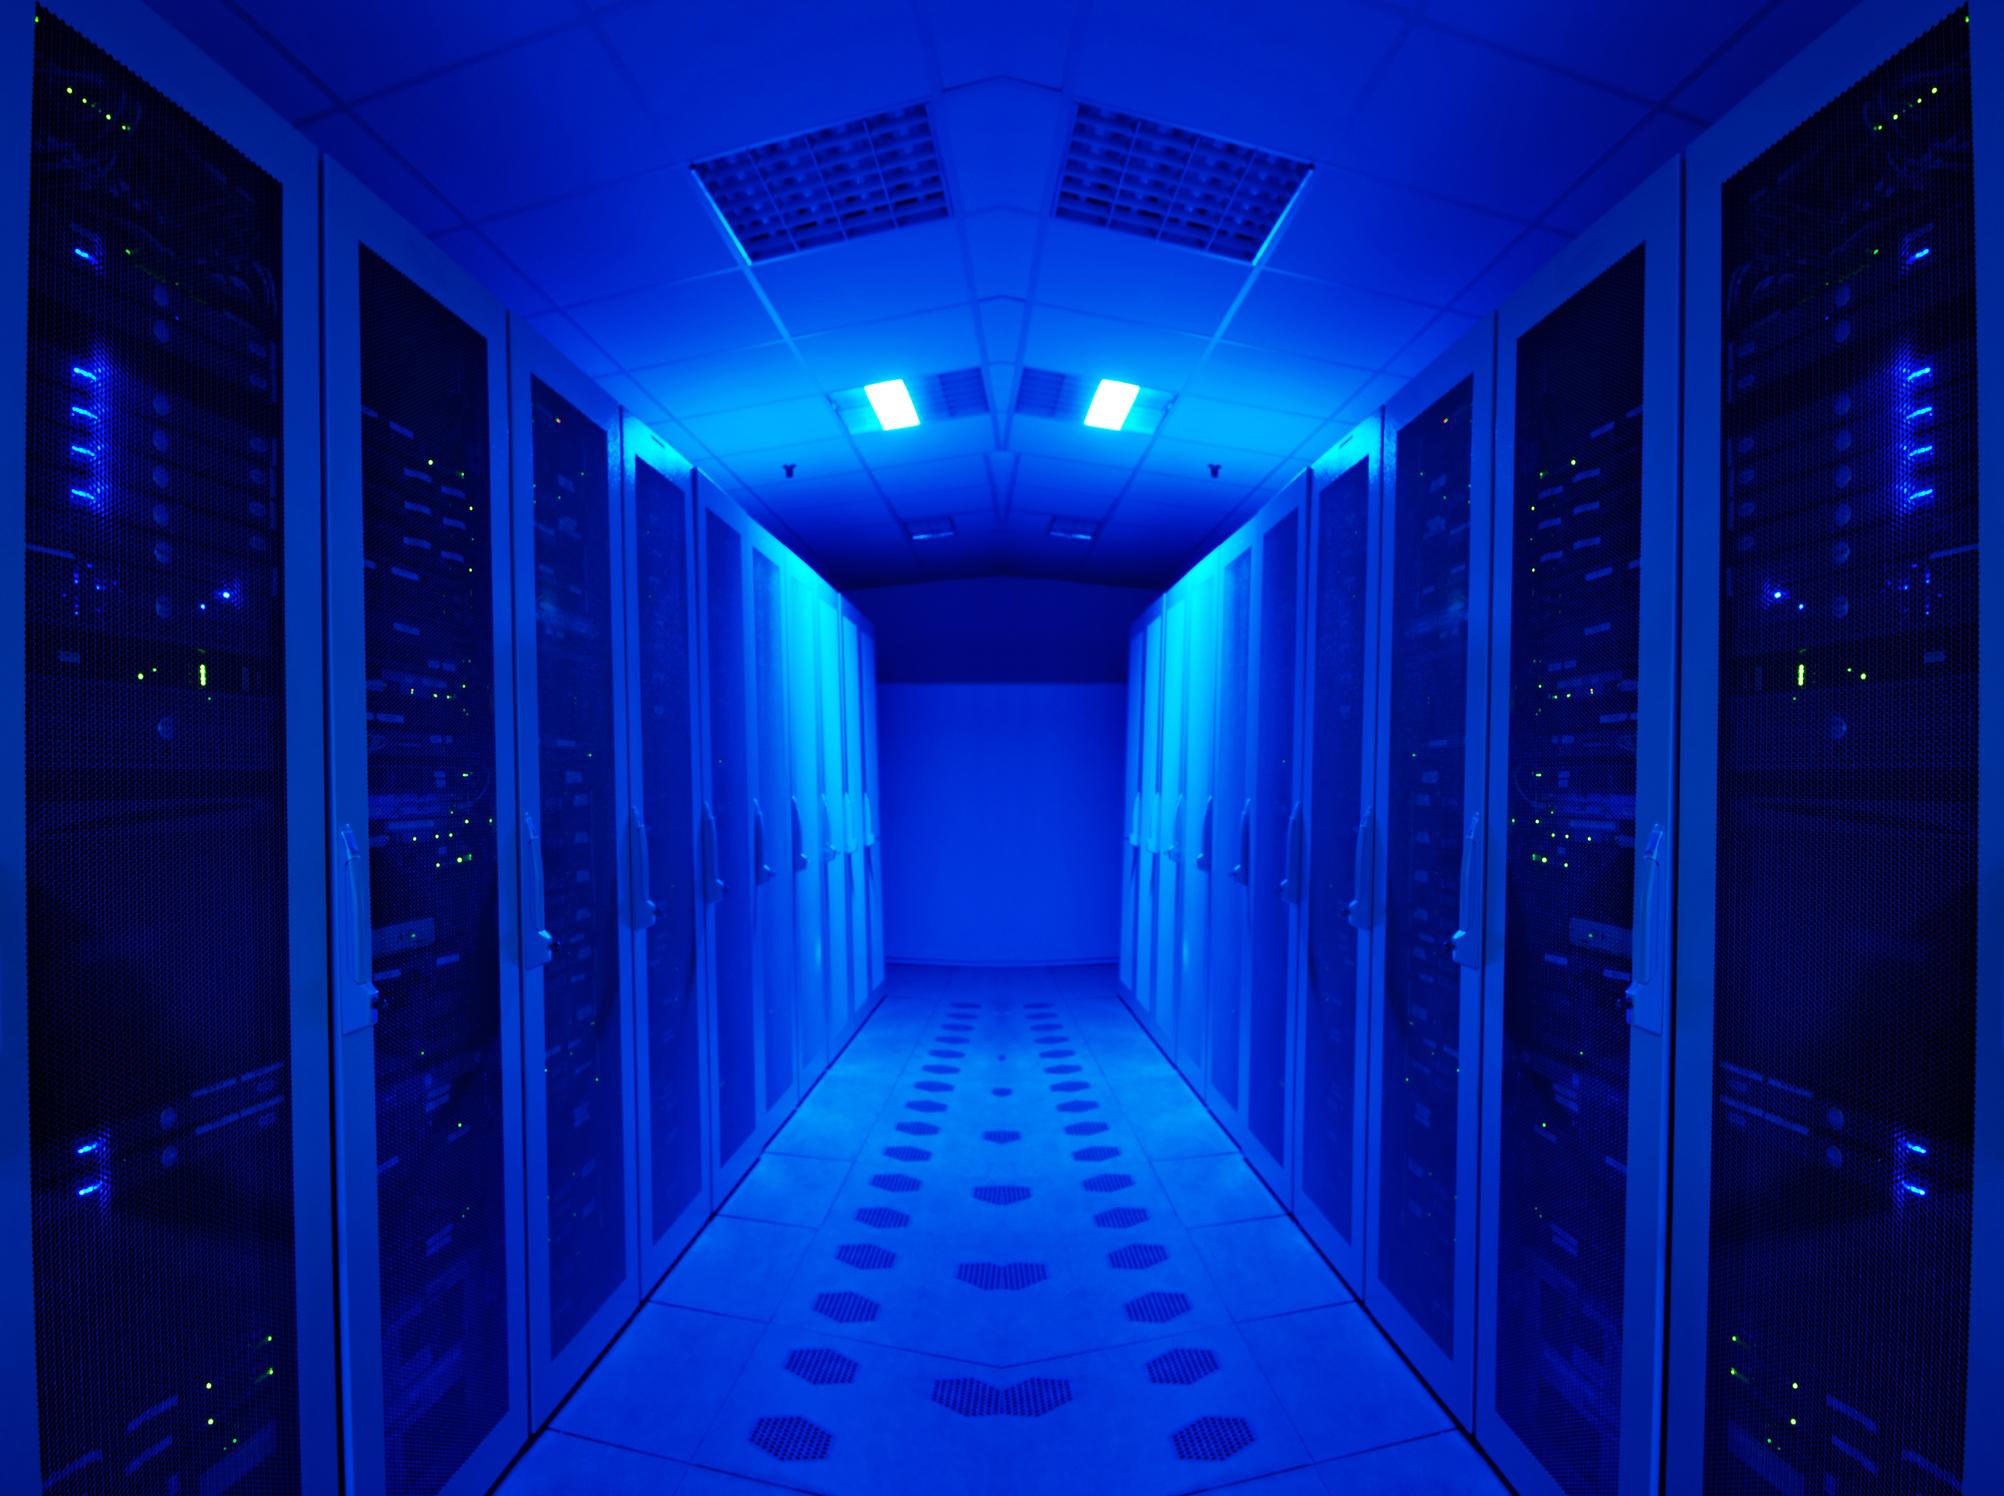 Banks of servers bathed in blue light